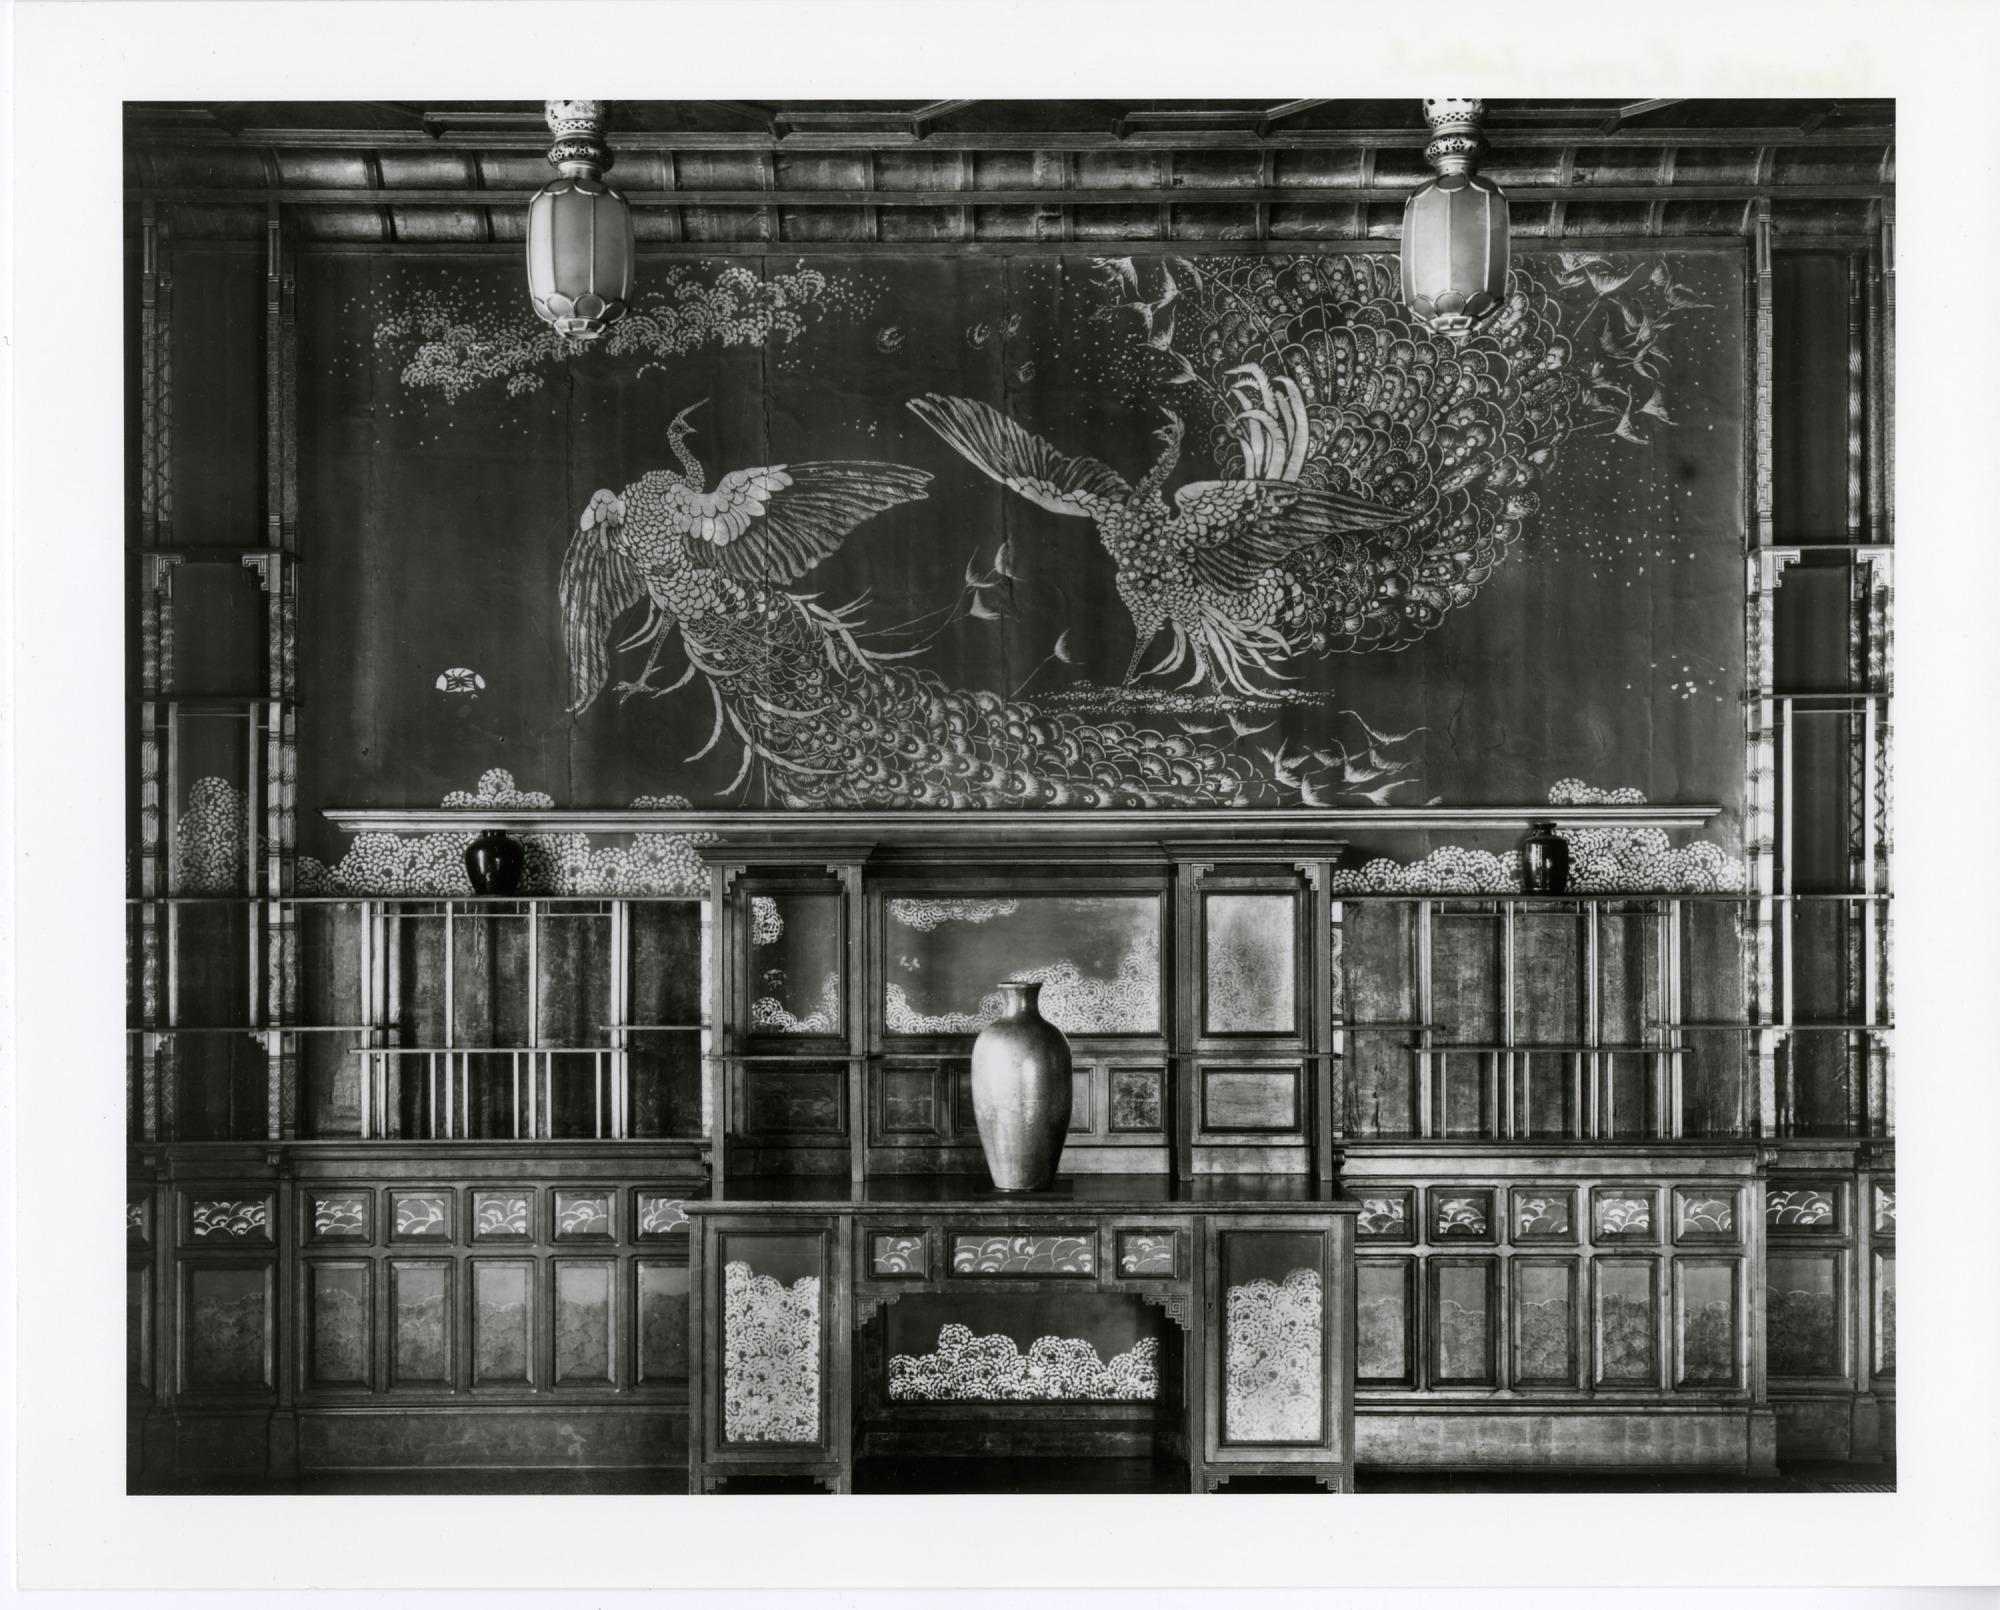 Freer Gallery of Art Peacock Room - Detail, South Wall